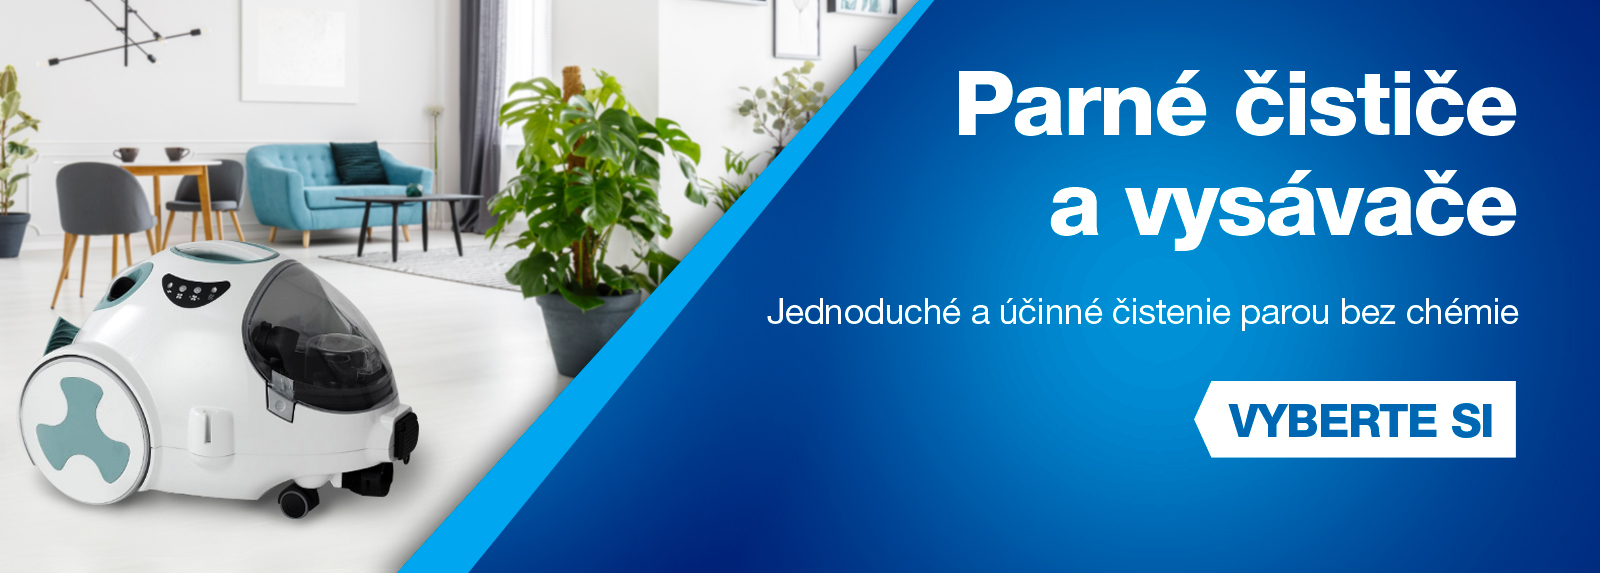 top_banner_1600x573_parni_cistice_sk